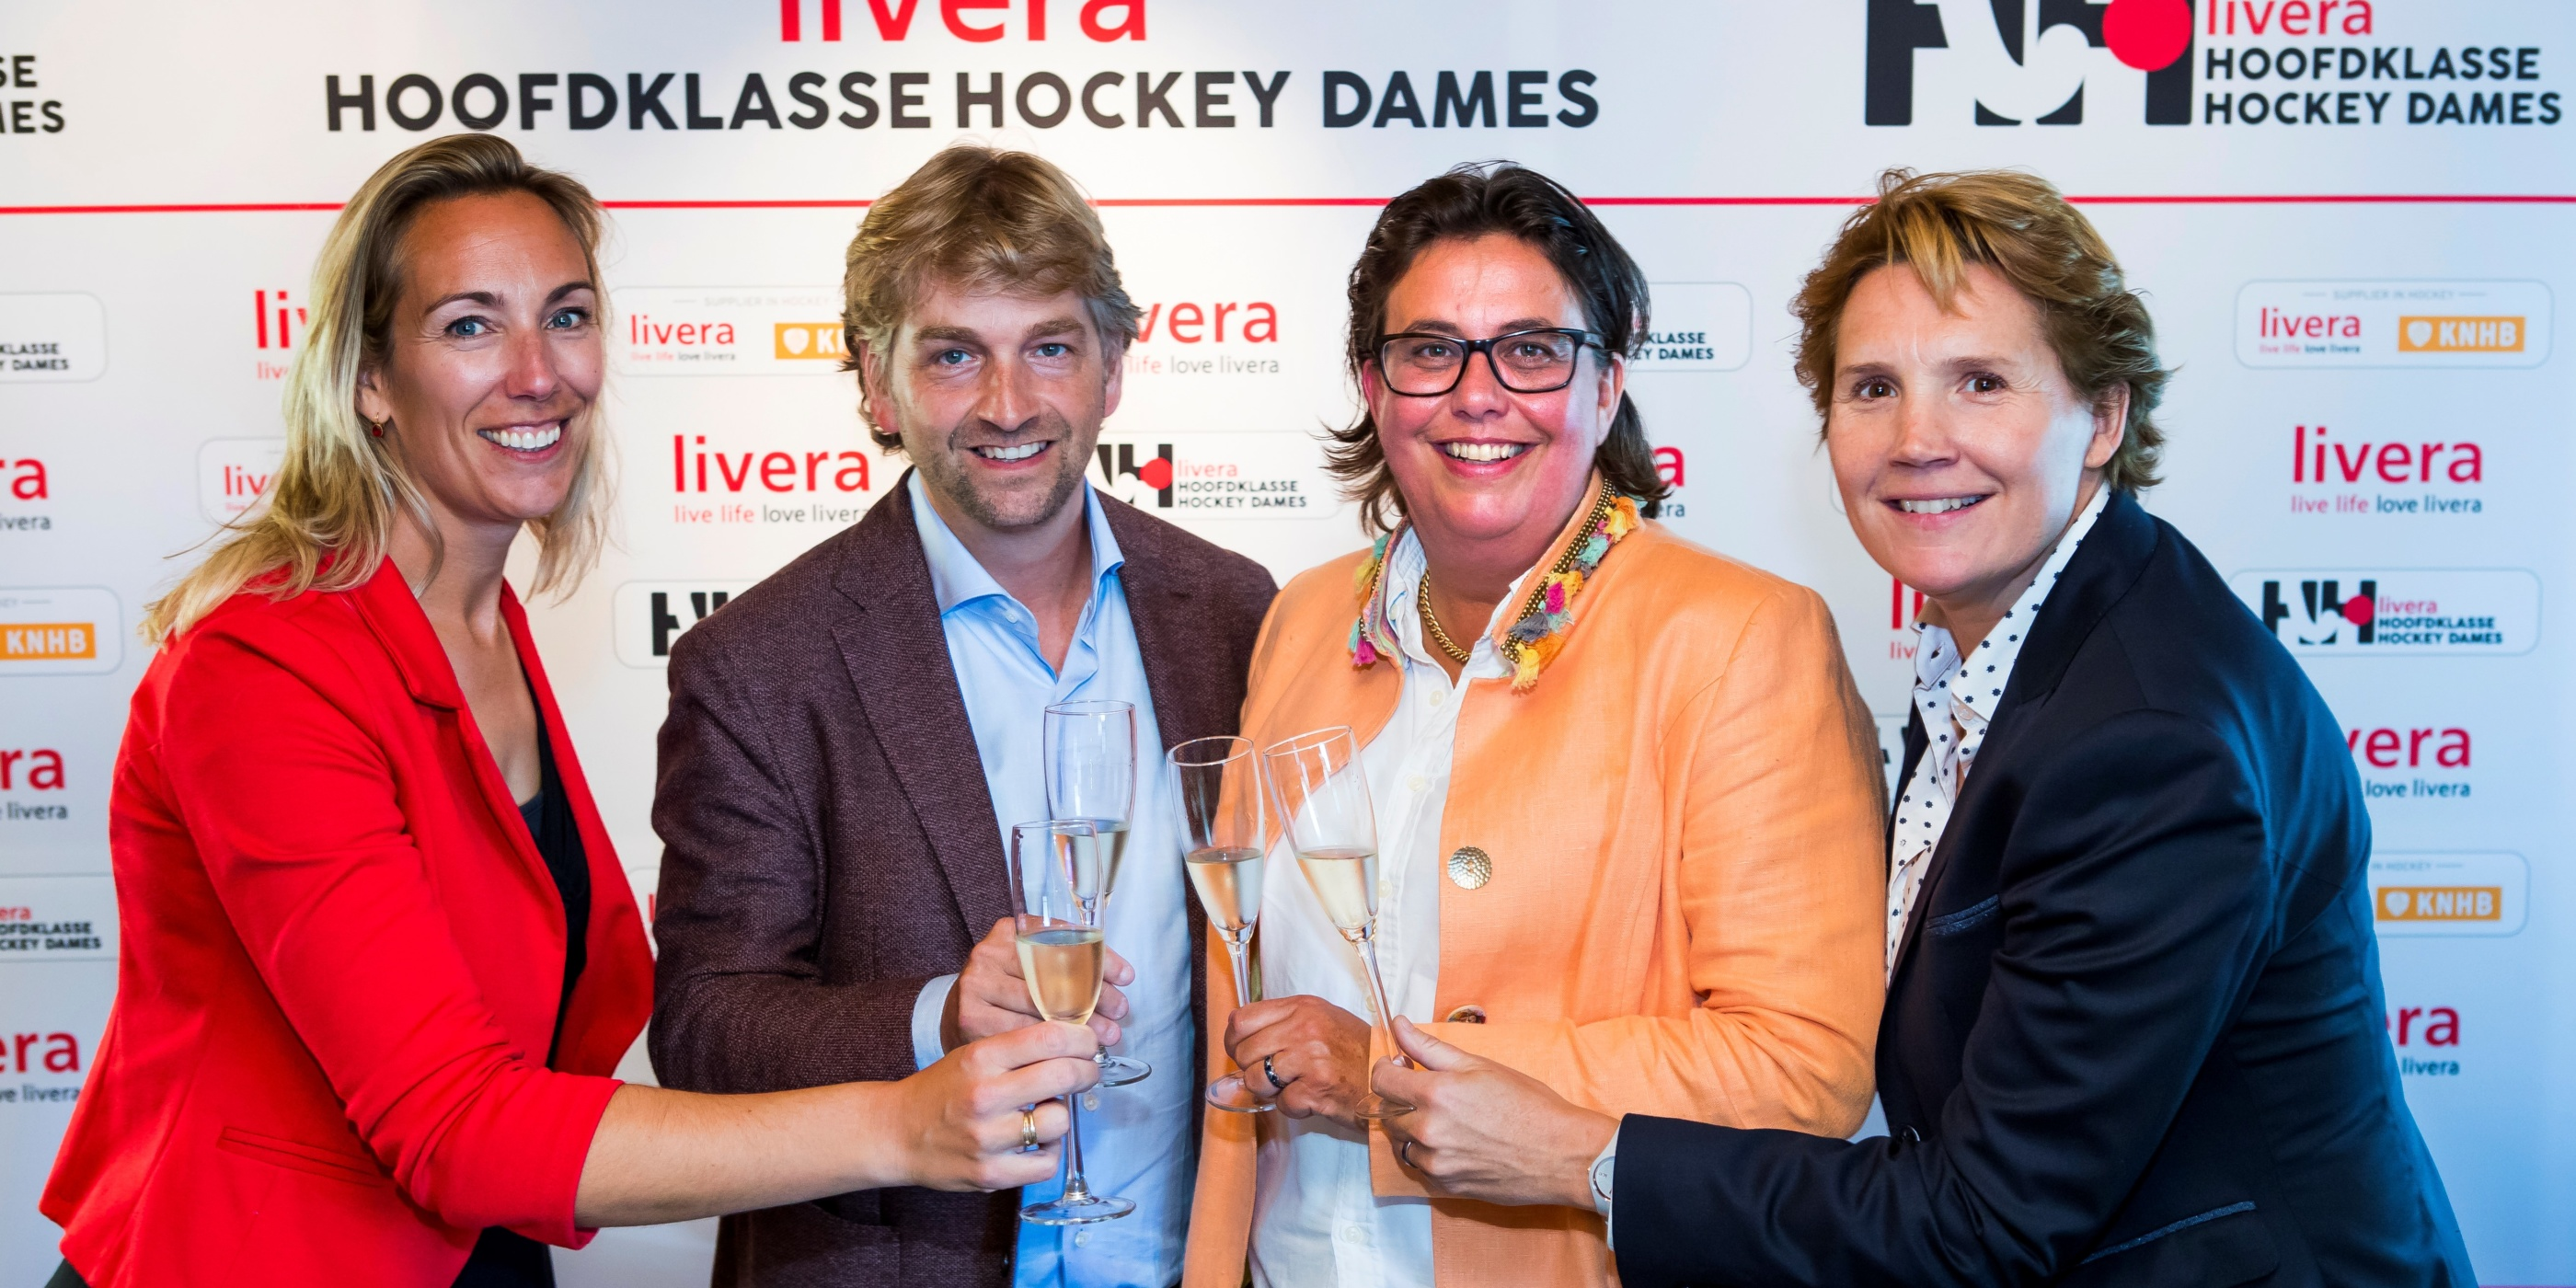 Livera hoofdpartner van Hoofdklasse Hockey Dames